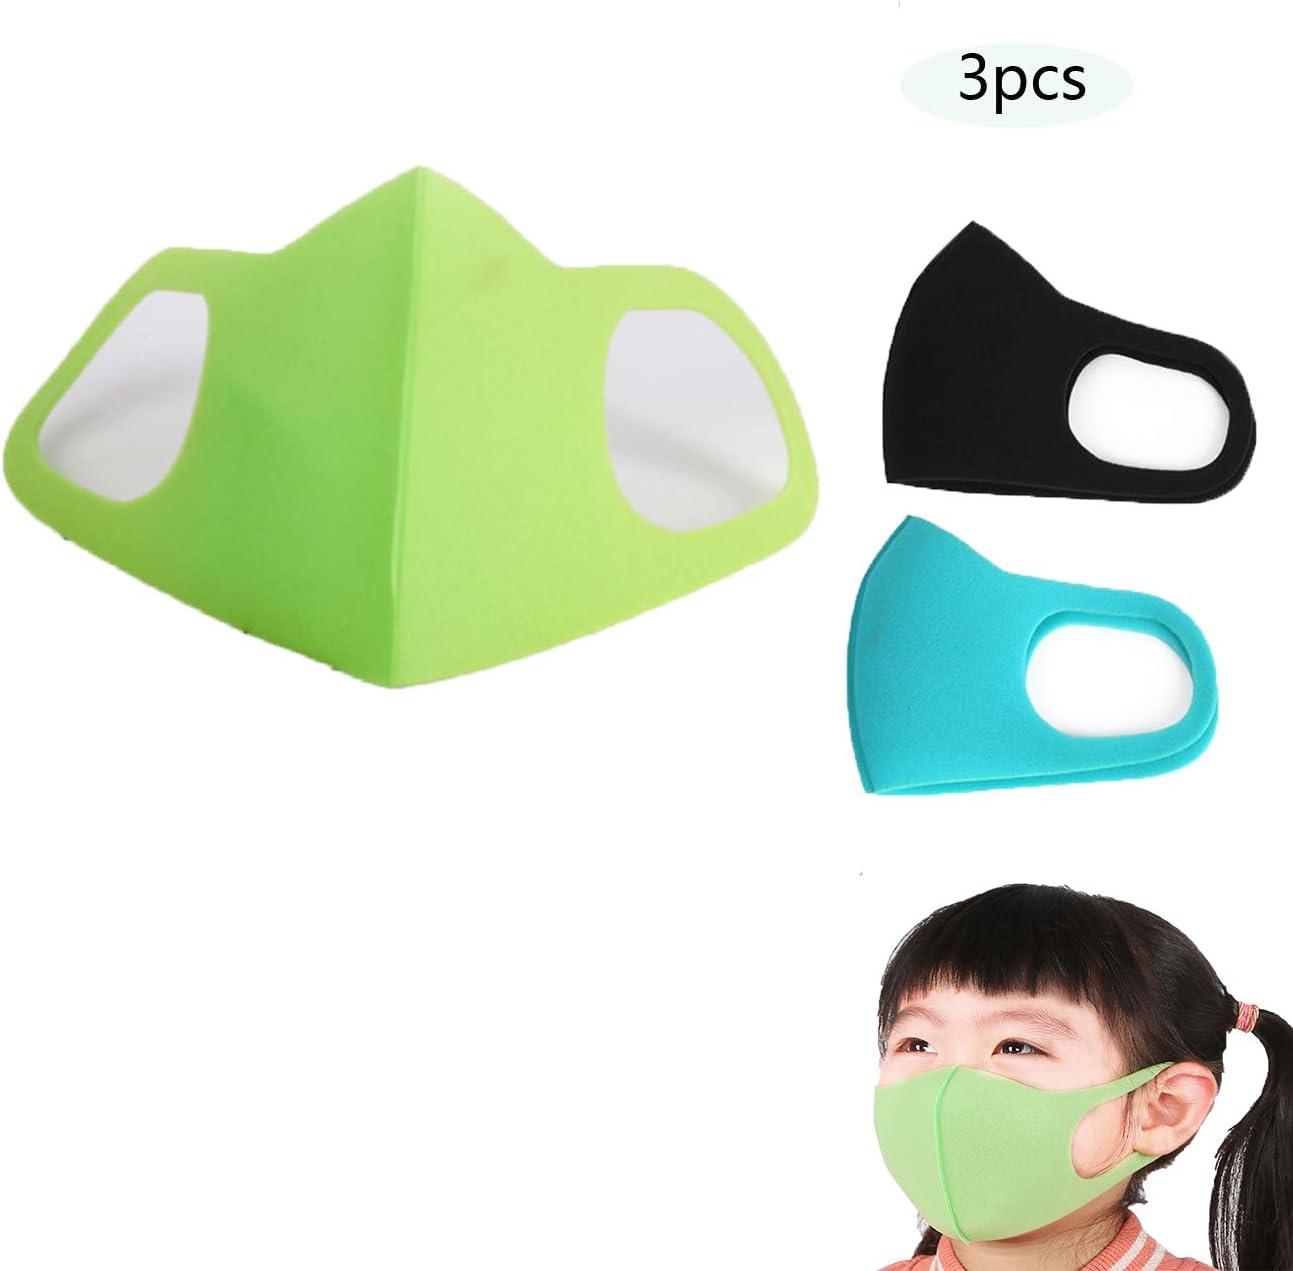 BALIBALU - Máscara Antipolvo anticontaminación N 95 Protect PM 2.5 Air Dust Mascarilla Lavable Mascarilla Respirador de algodón con válvula Filtro reemplazable